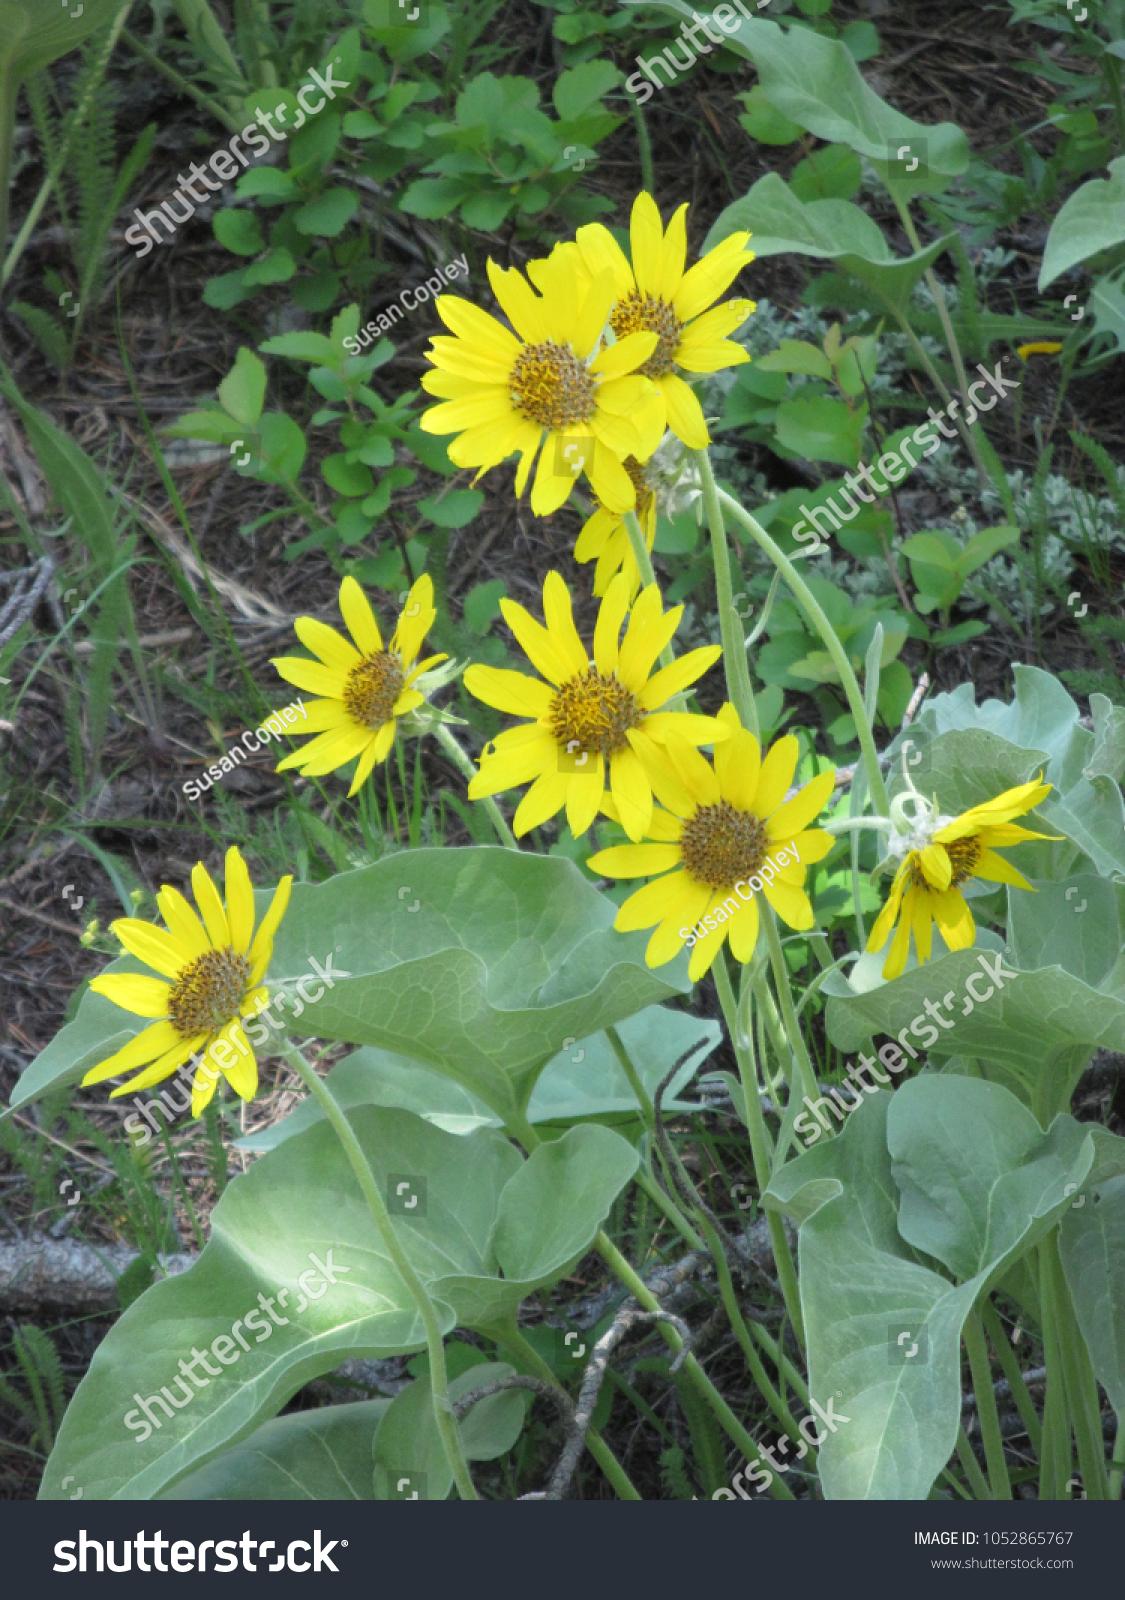 Daisy Like Yellow Flowers Celandine Weed Stock Photo Edit Now